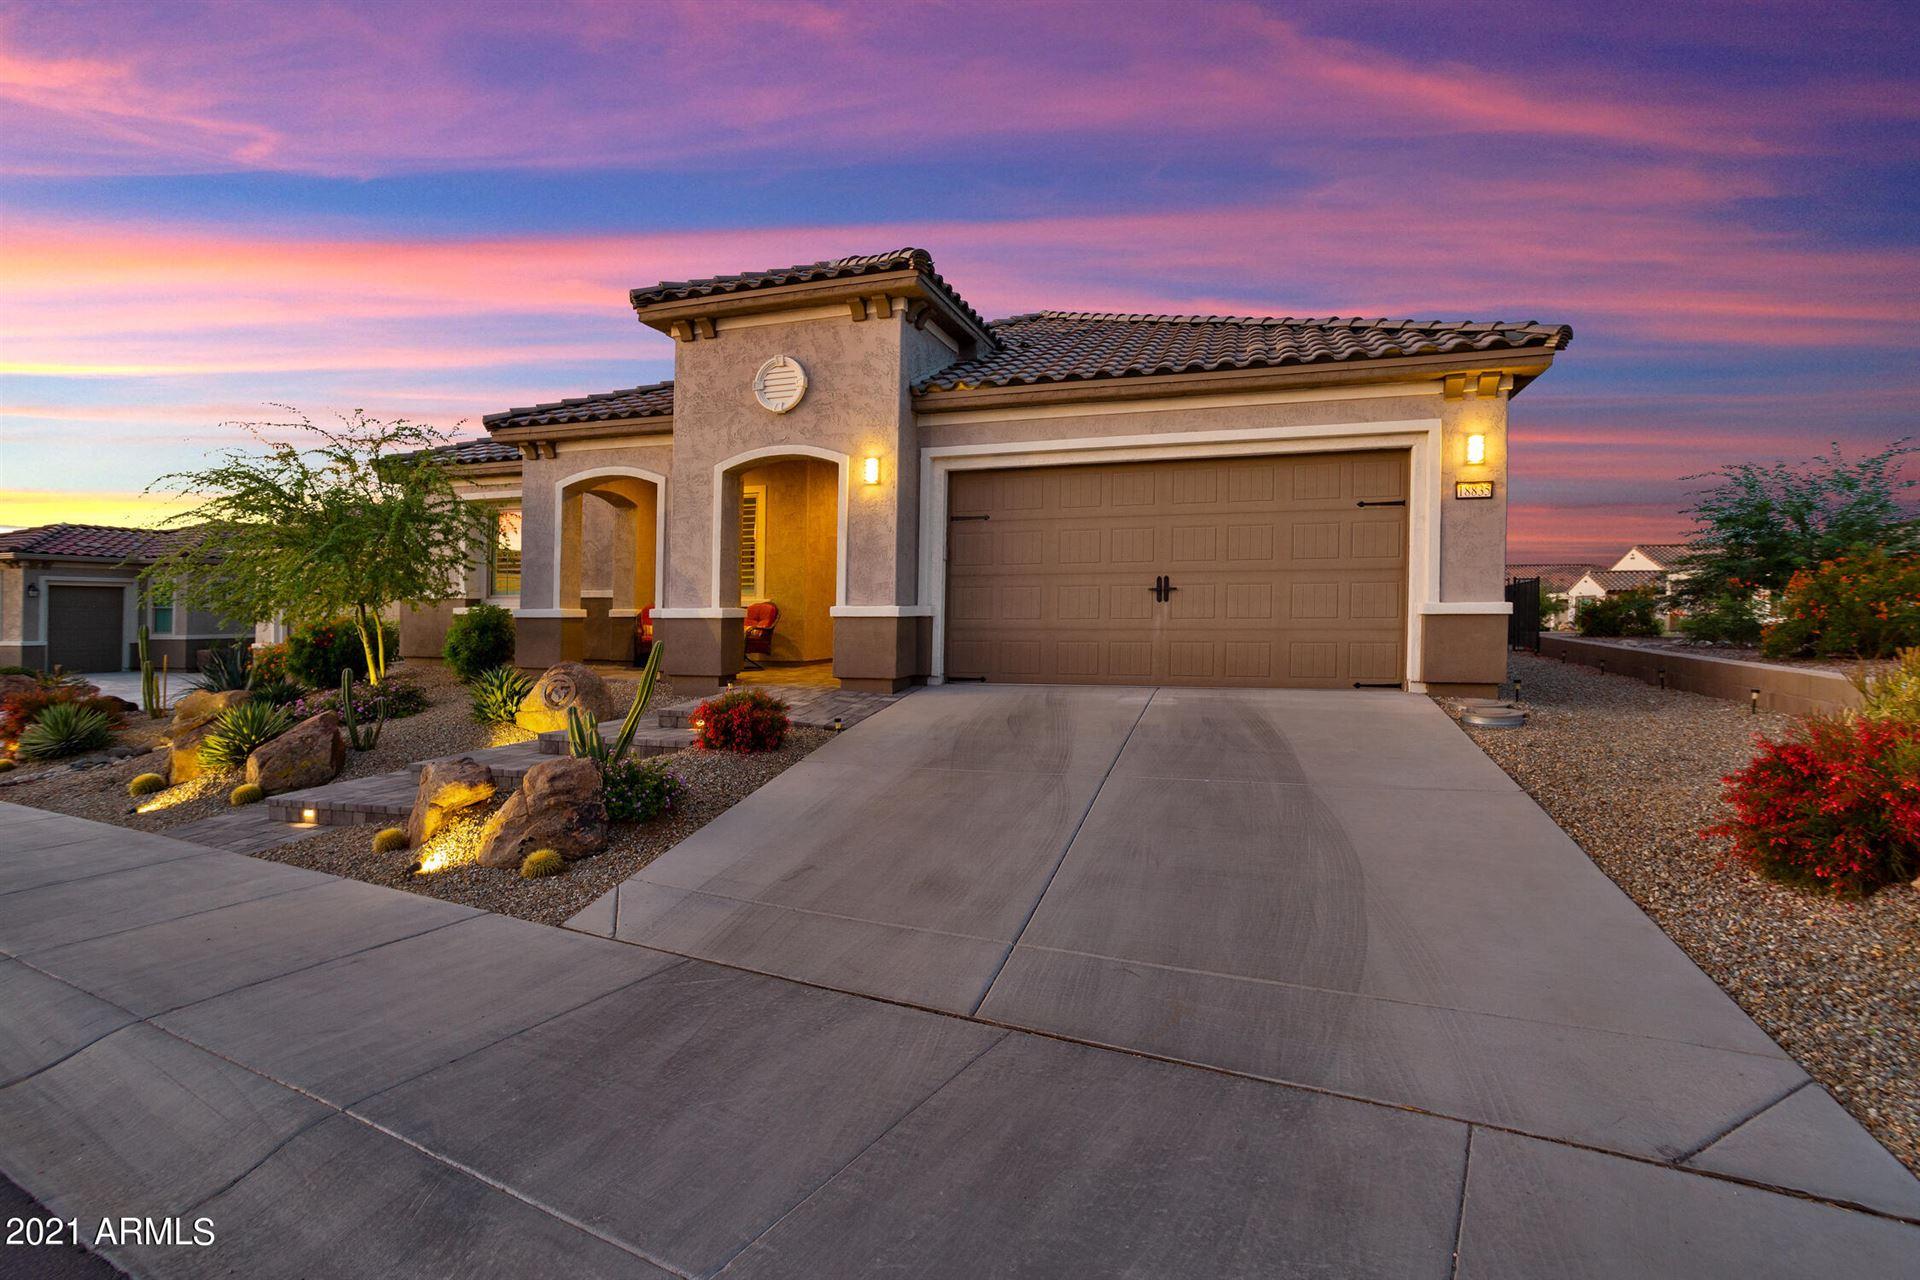 Photo of 18835 N 261ST Lane, Buckeye, AZ 85396 (MLS # 6249684)